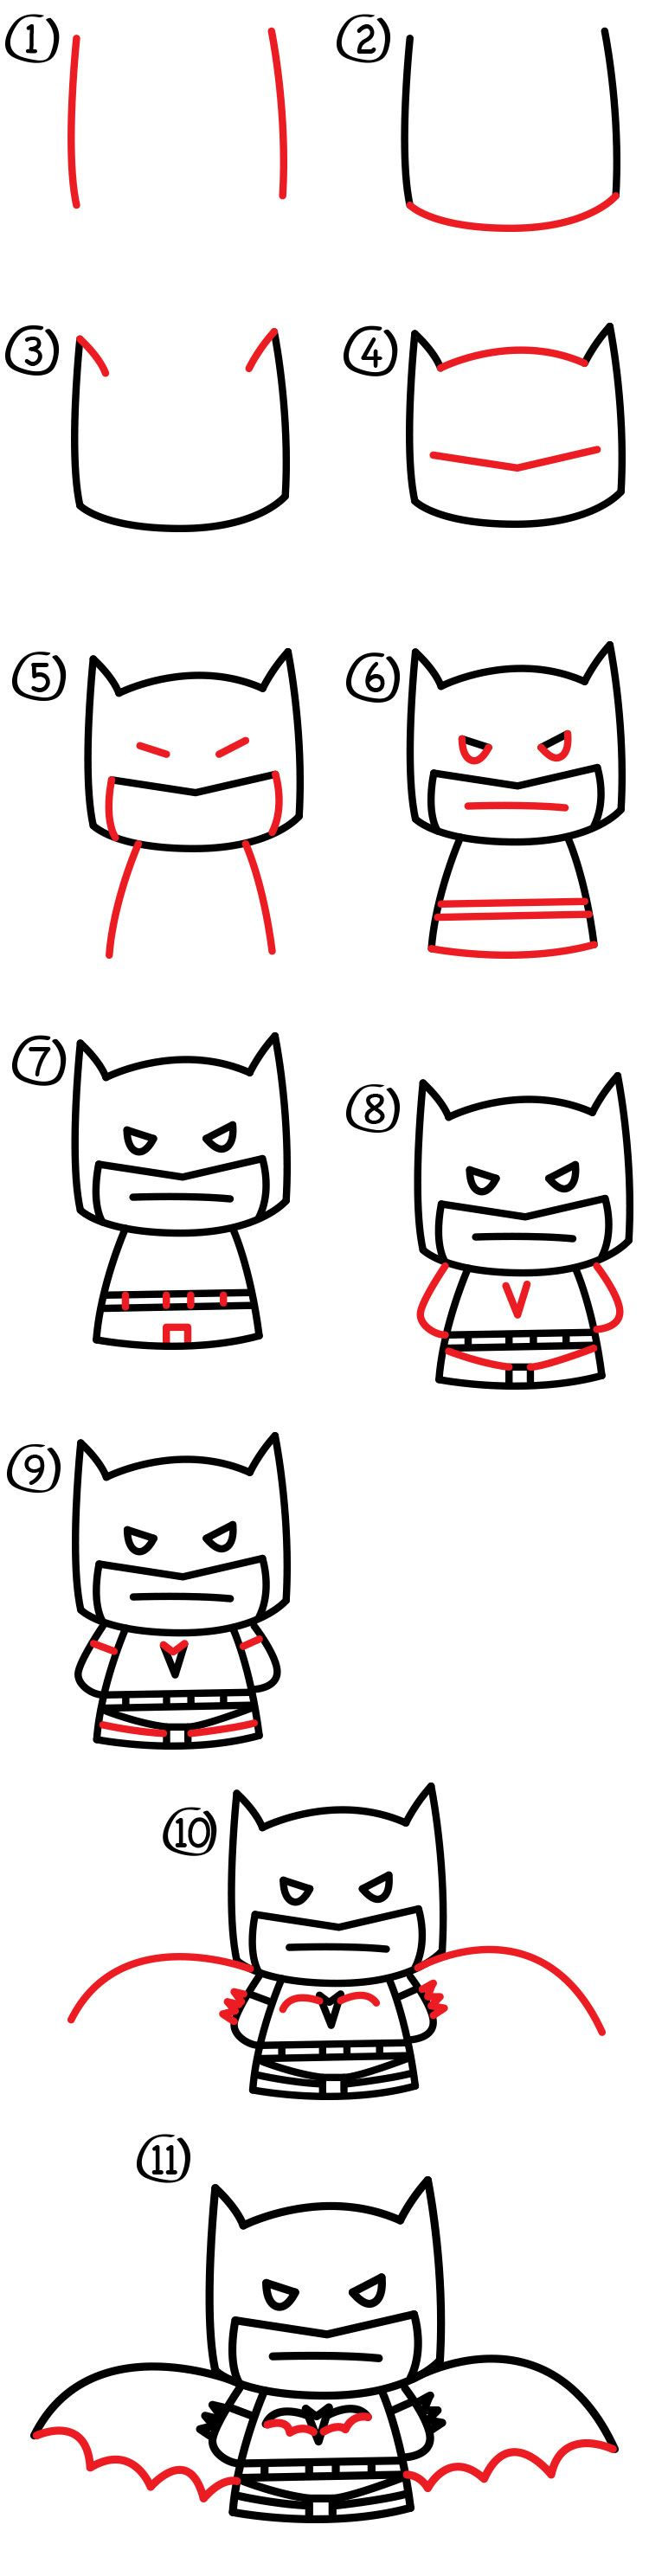 How To Draw Cartoon Batman - Art For Kids Hub - | Dibujo, Dibujar y ...